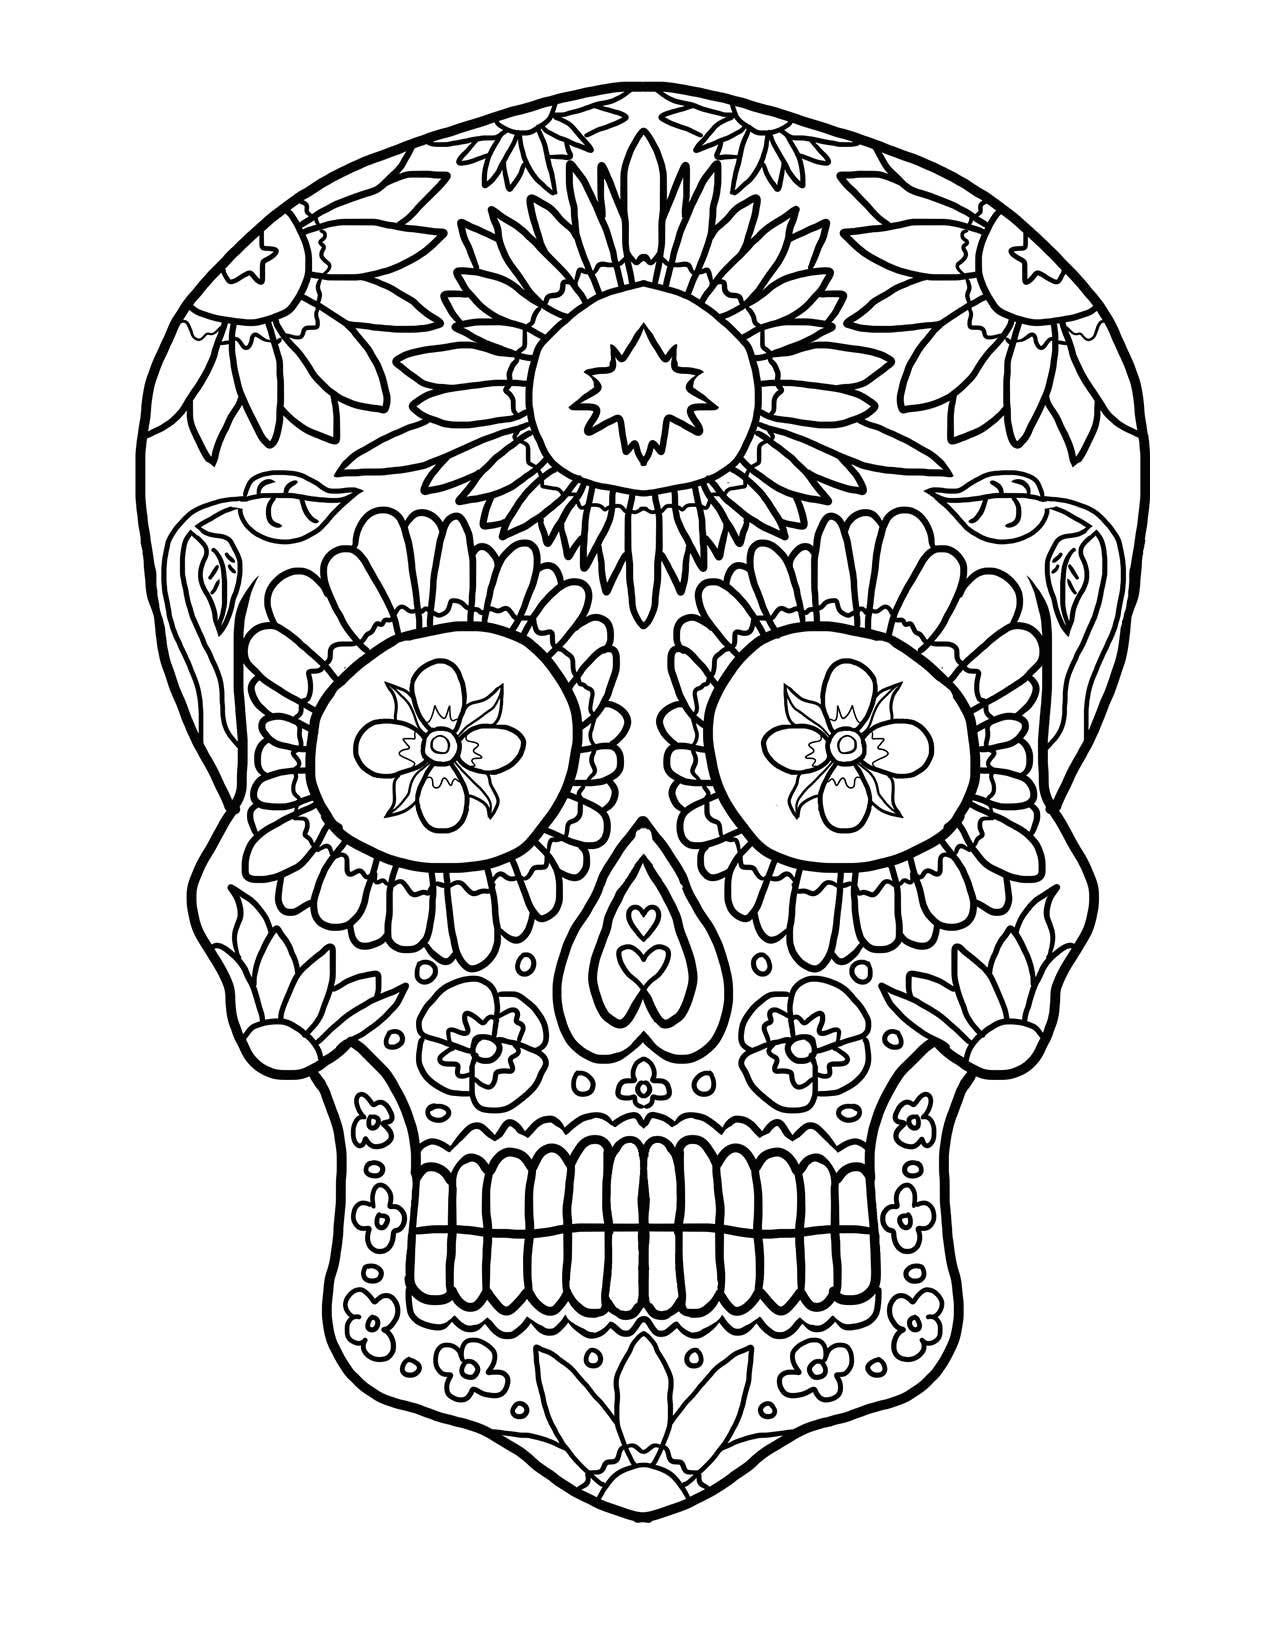 Mandala Skull Coloring Pages At Getcolorings